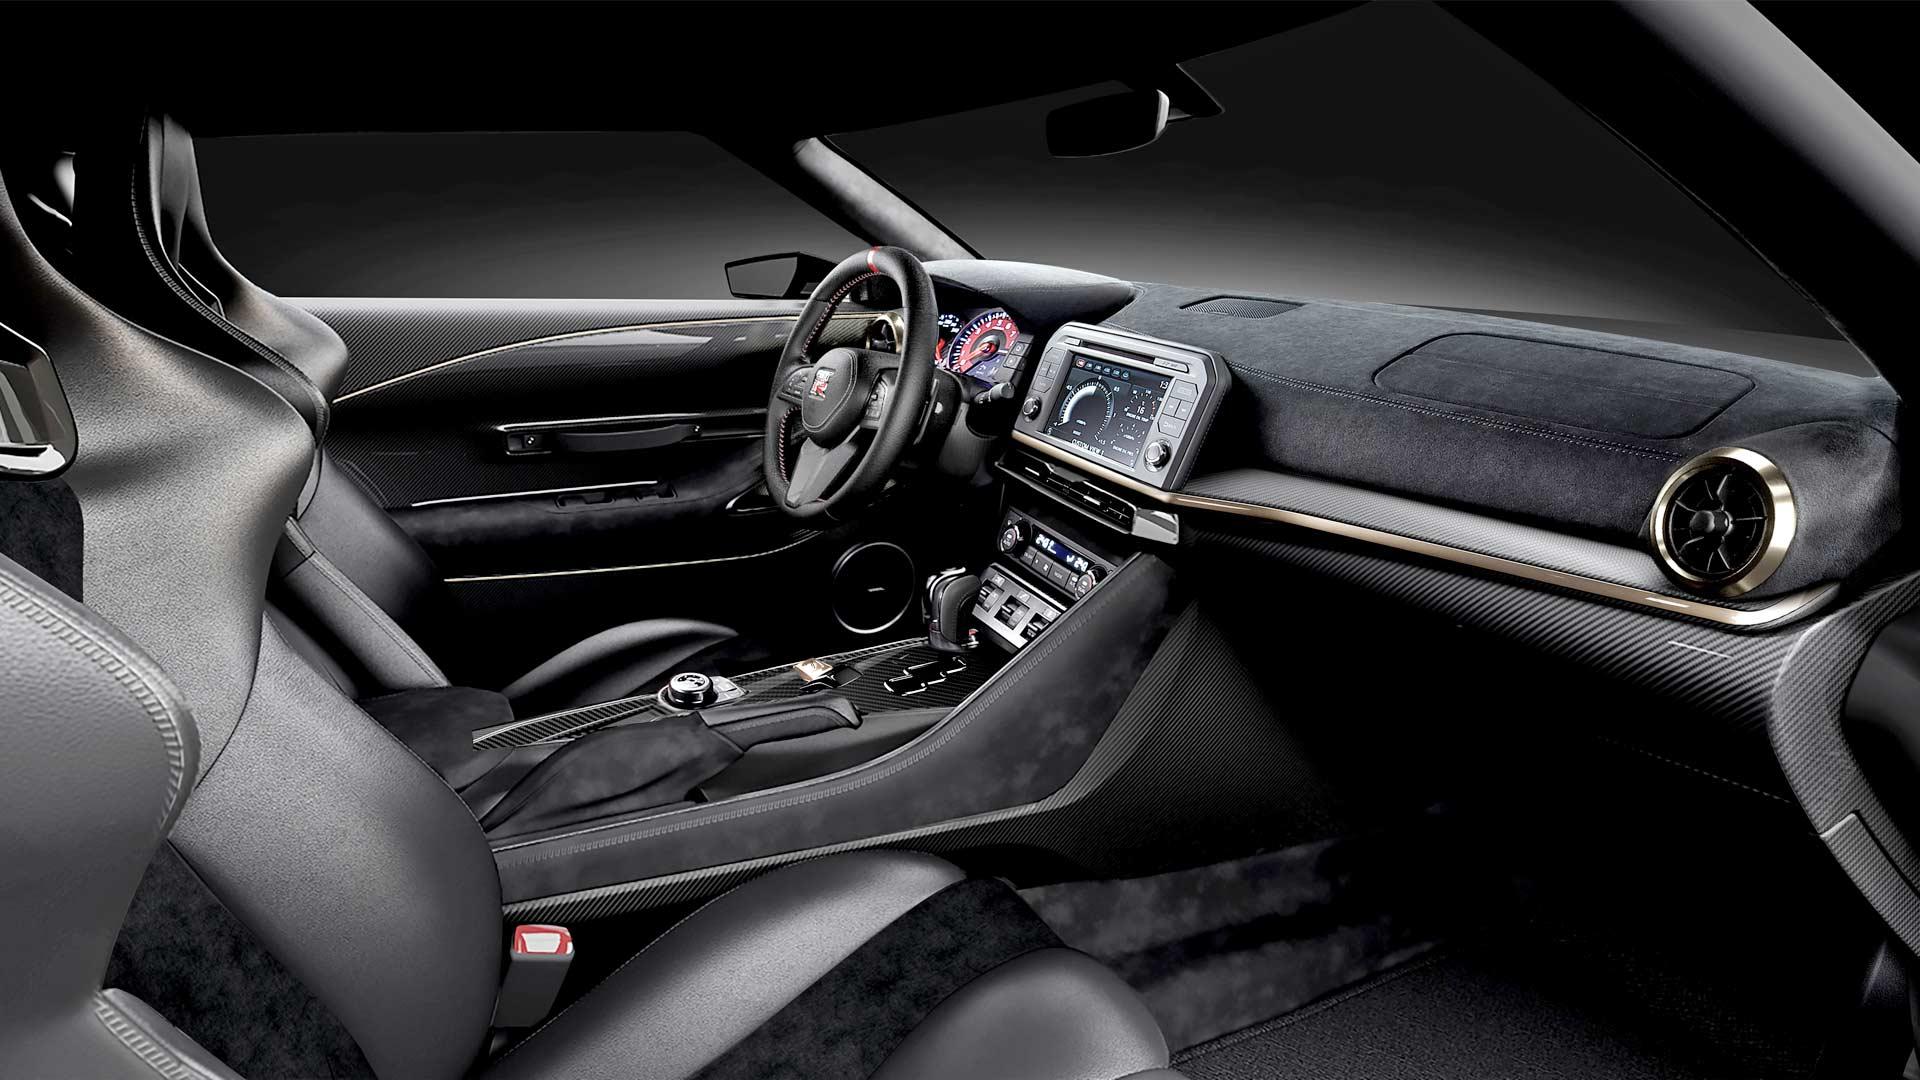 Nissan-GT-R50-production-version-Interior